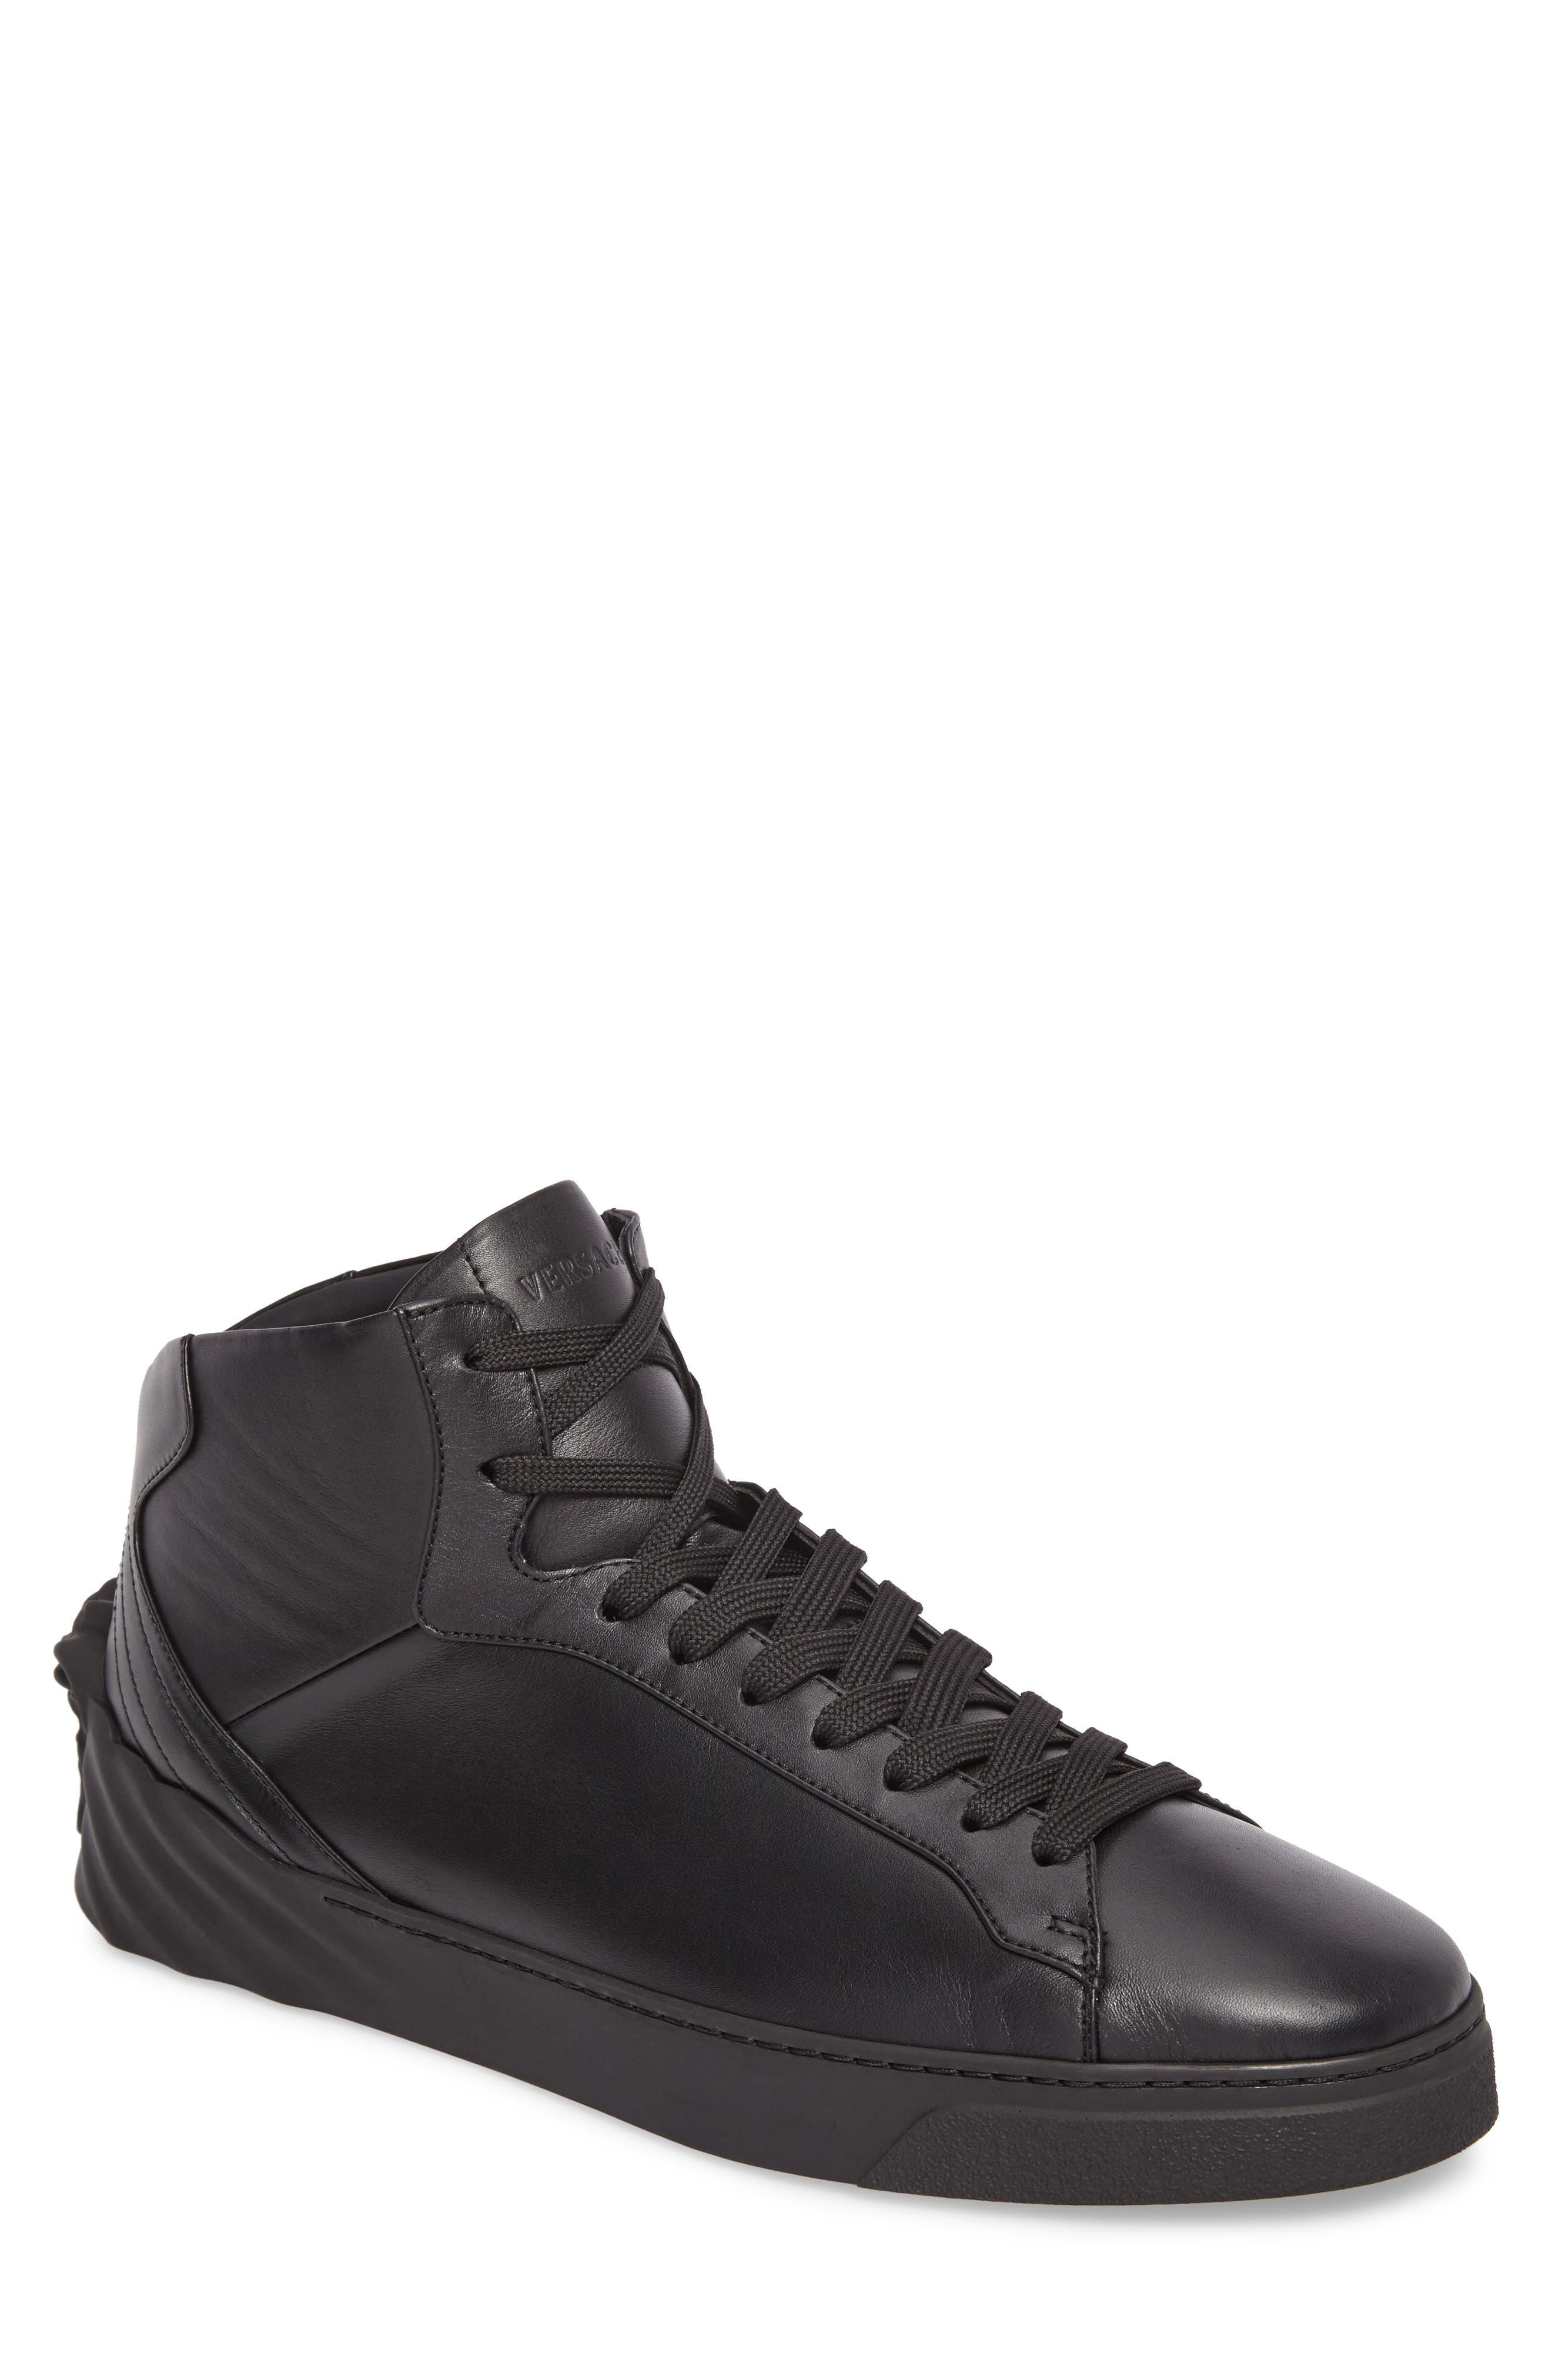 3D Medusa Sneaker,                         Main,                         color, 008